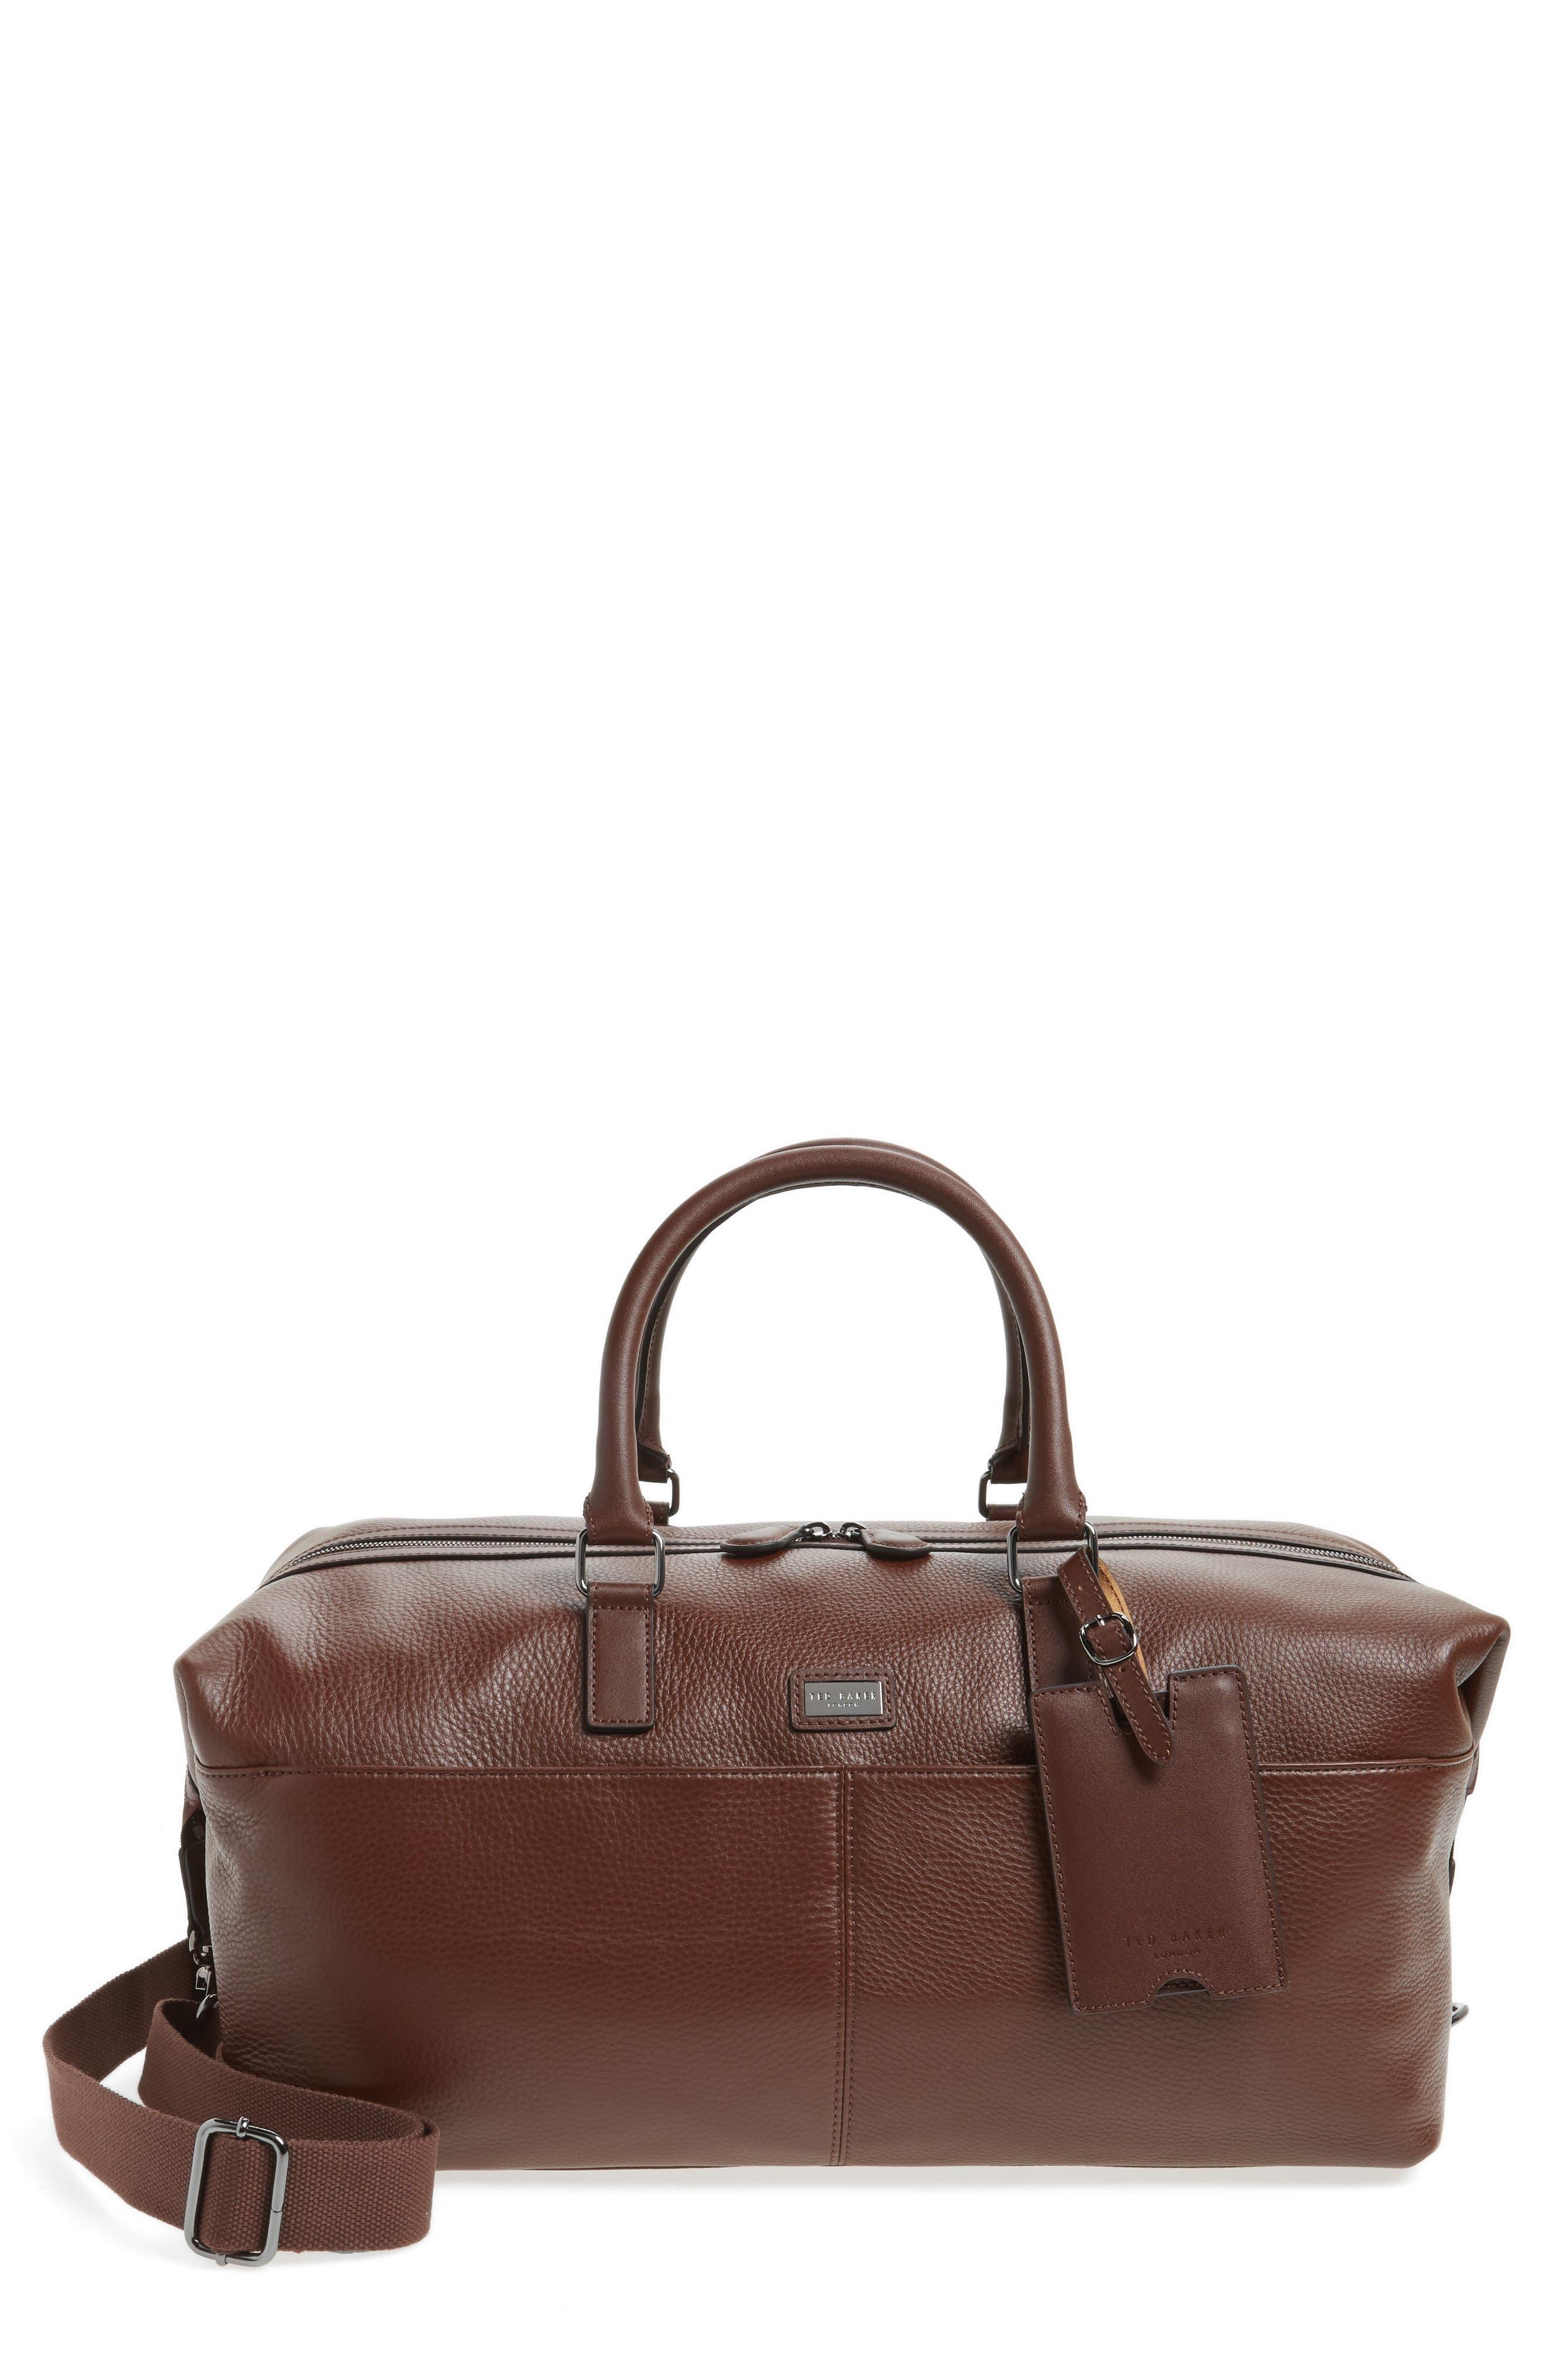 Leather Duffel Bag,                         Main,                         color, 217